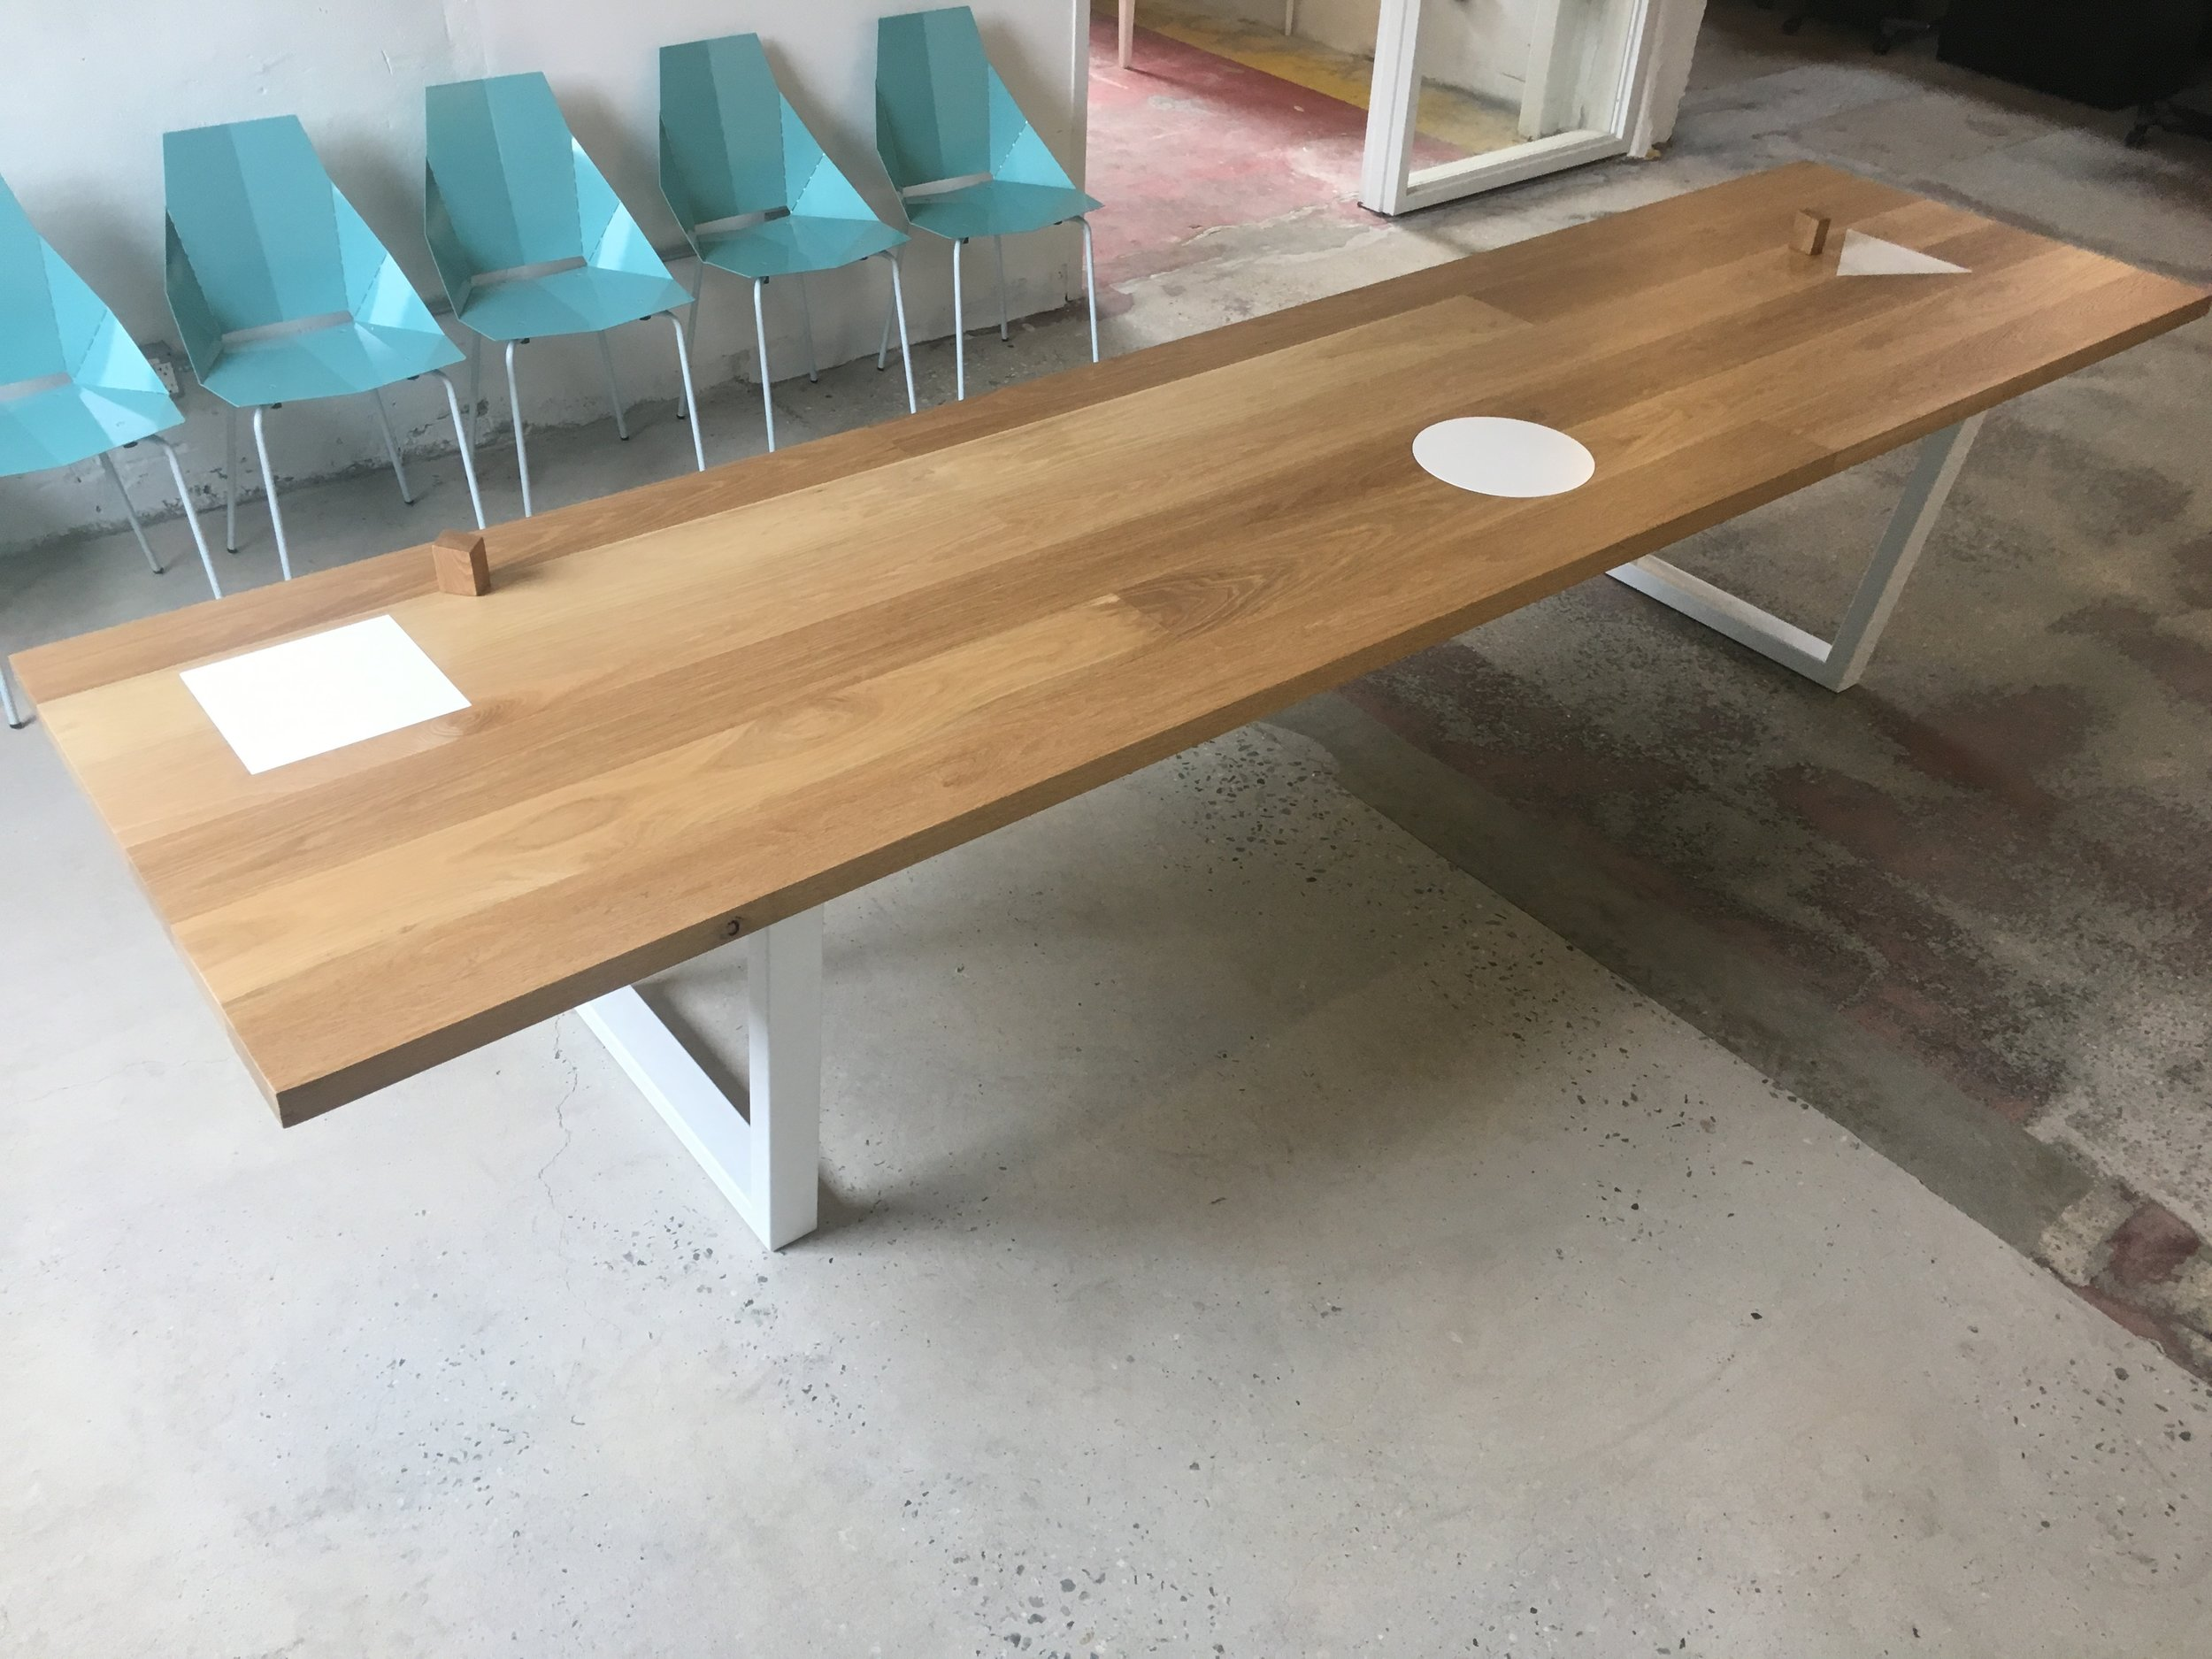 Mini Cooper A/D/O Conference Table